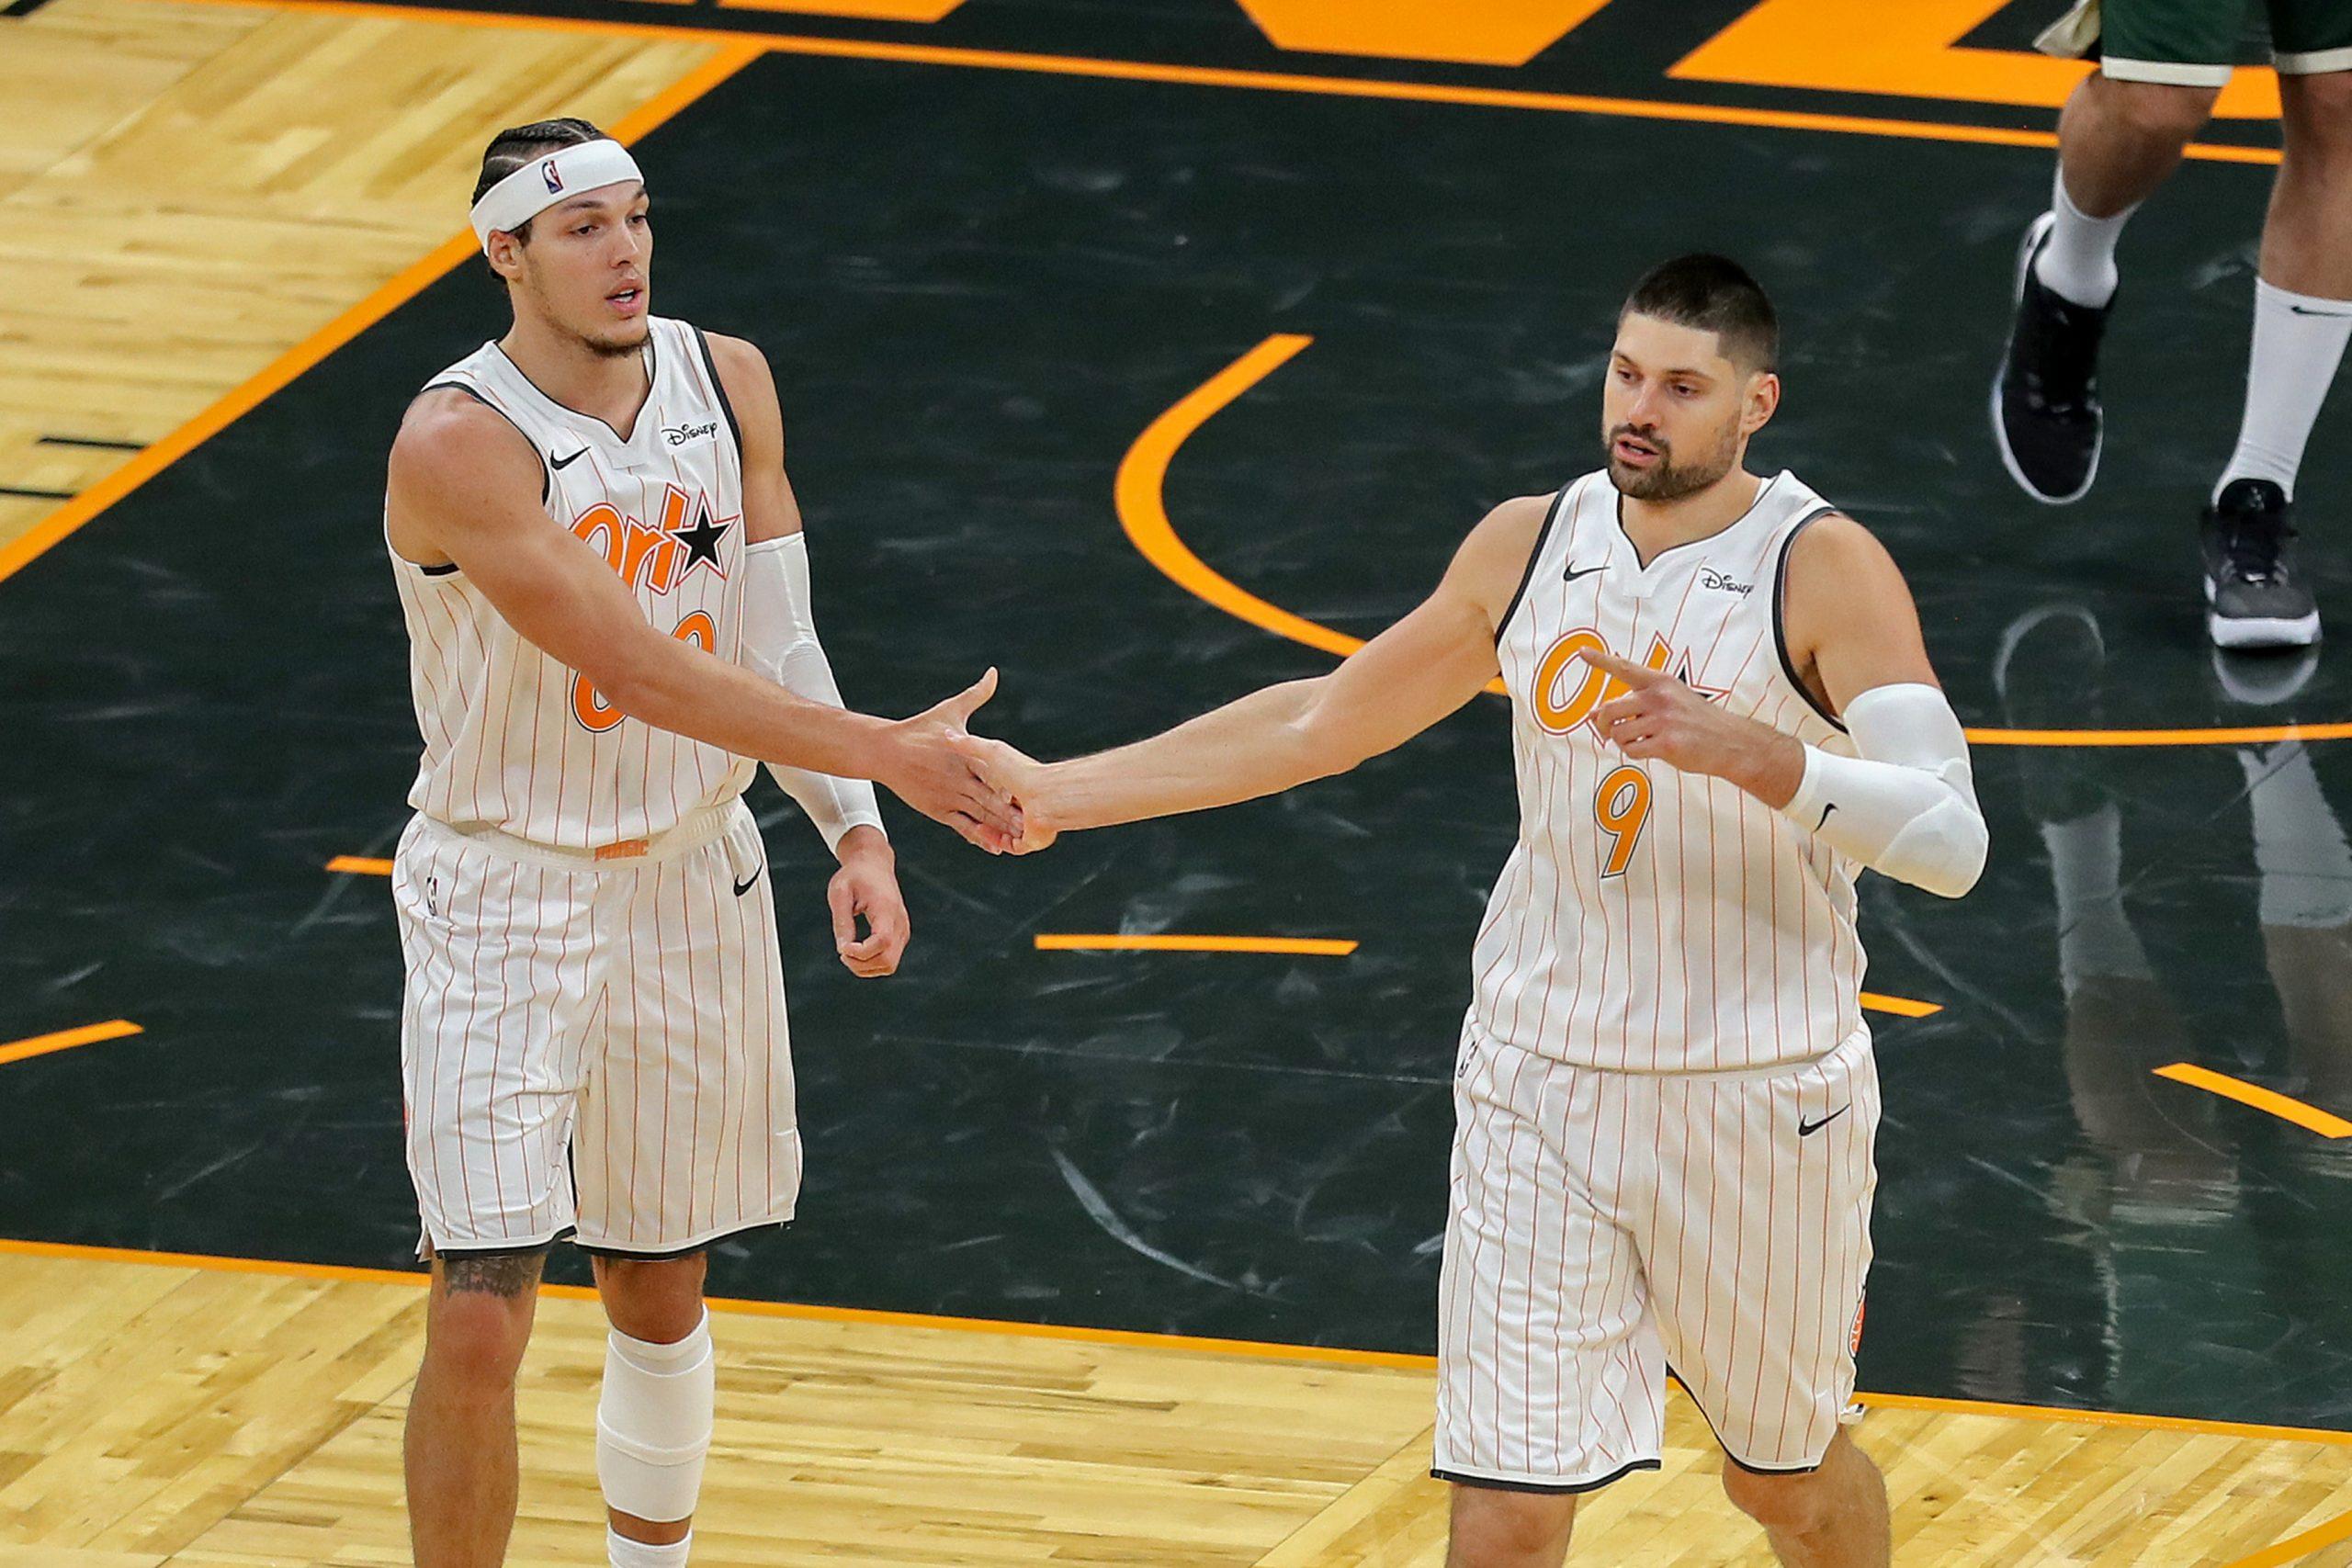 Comeback Knicks, De'Aaron Fox szef, prze-blok Adebayo